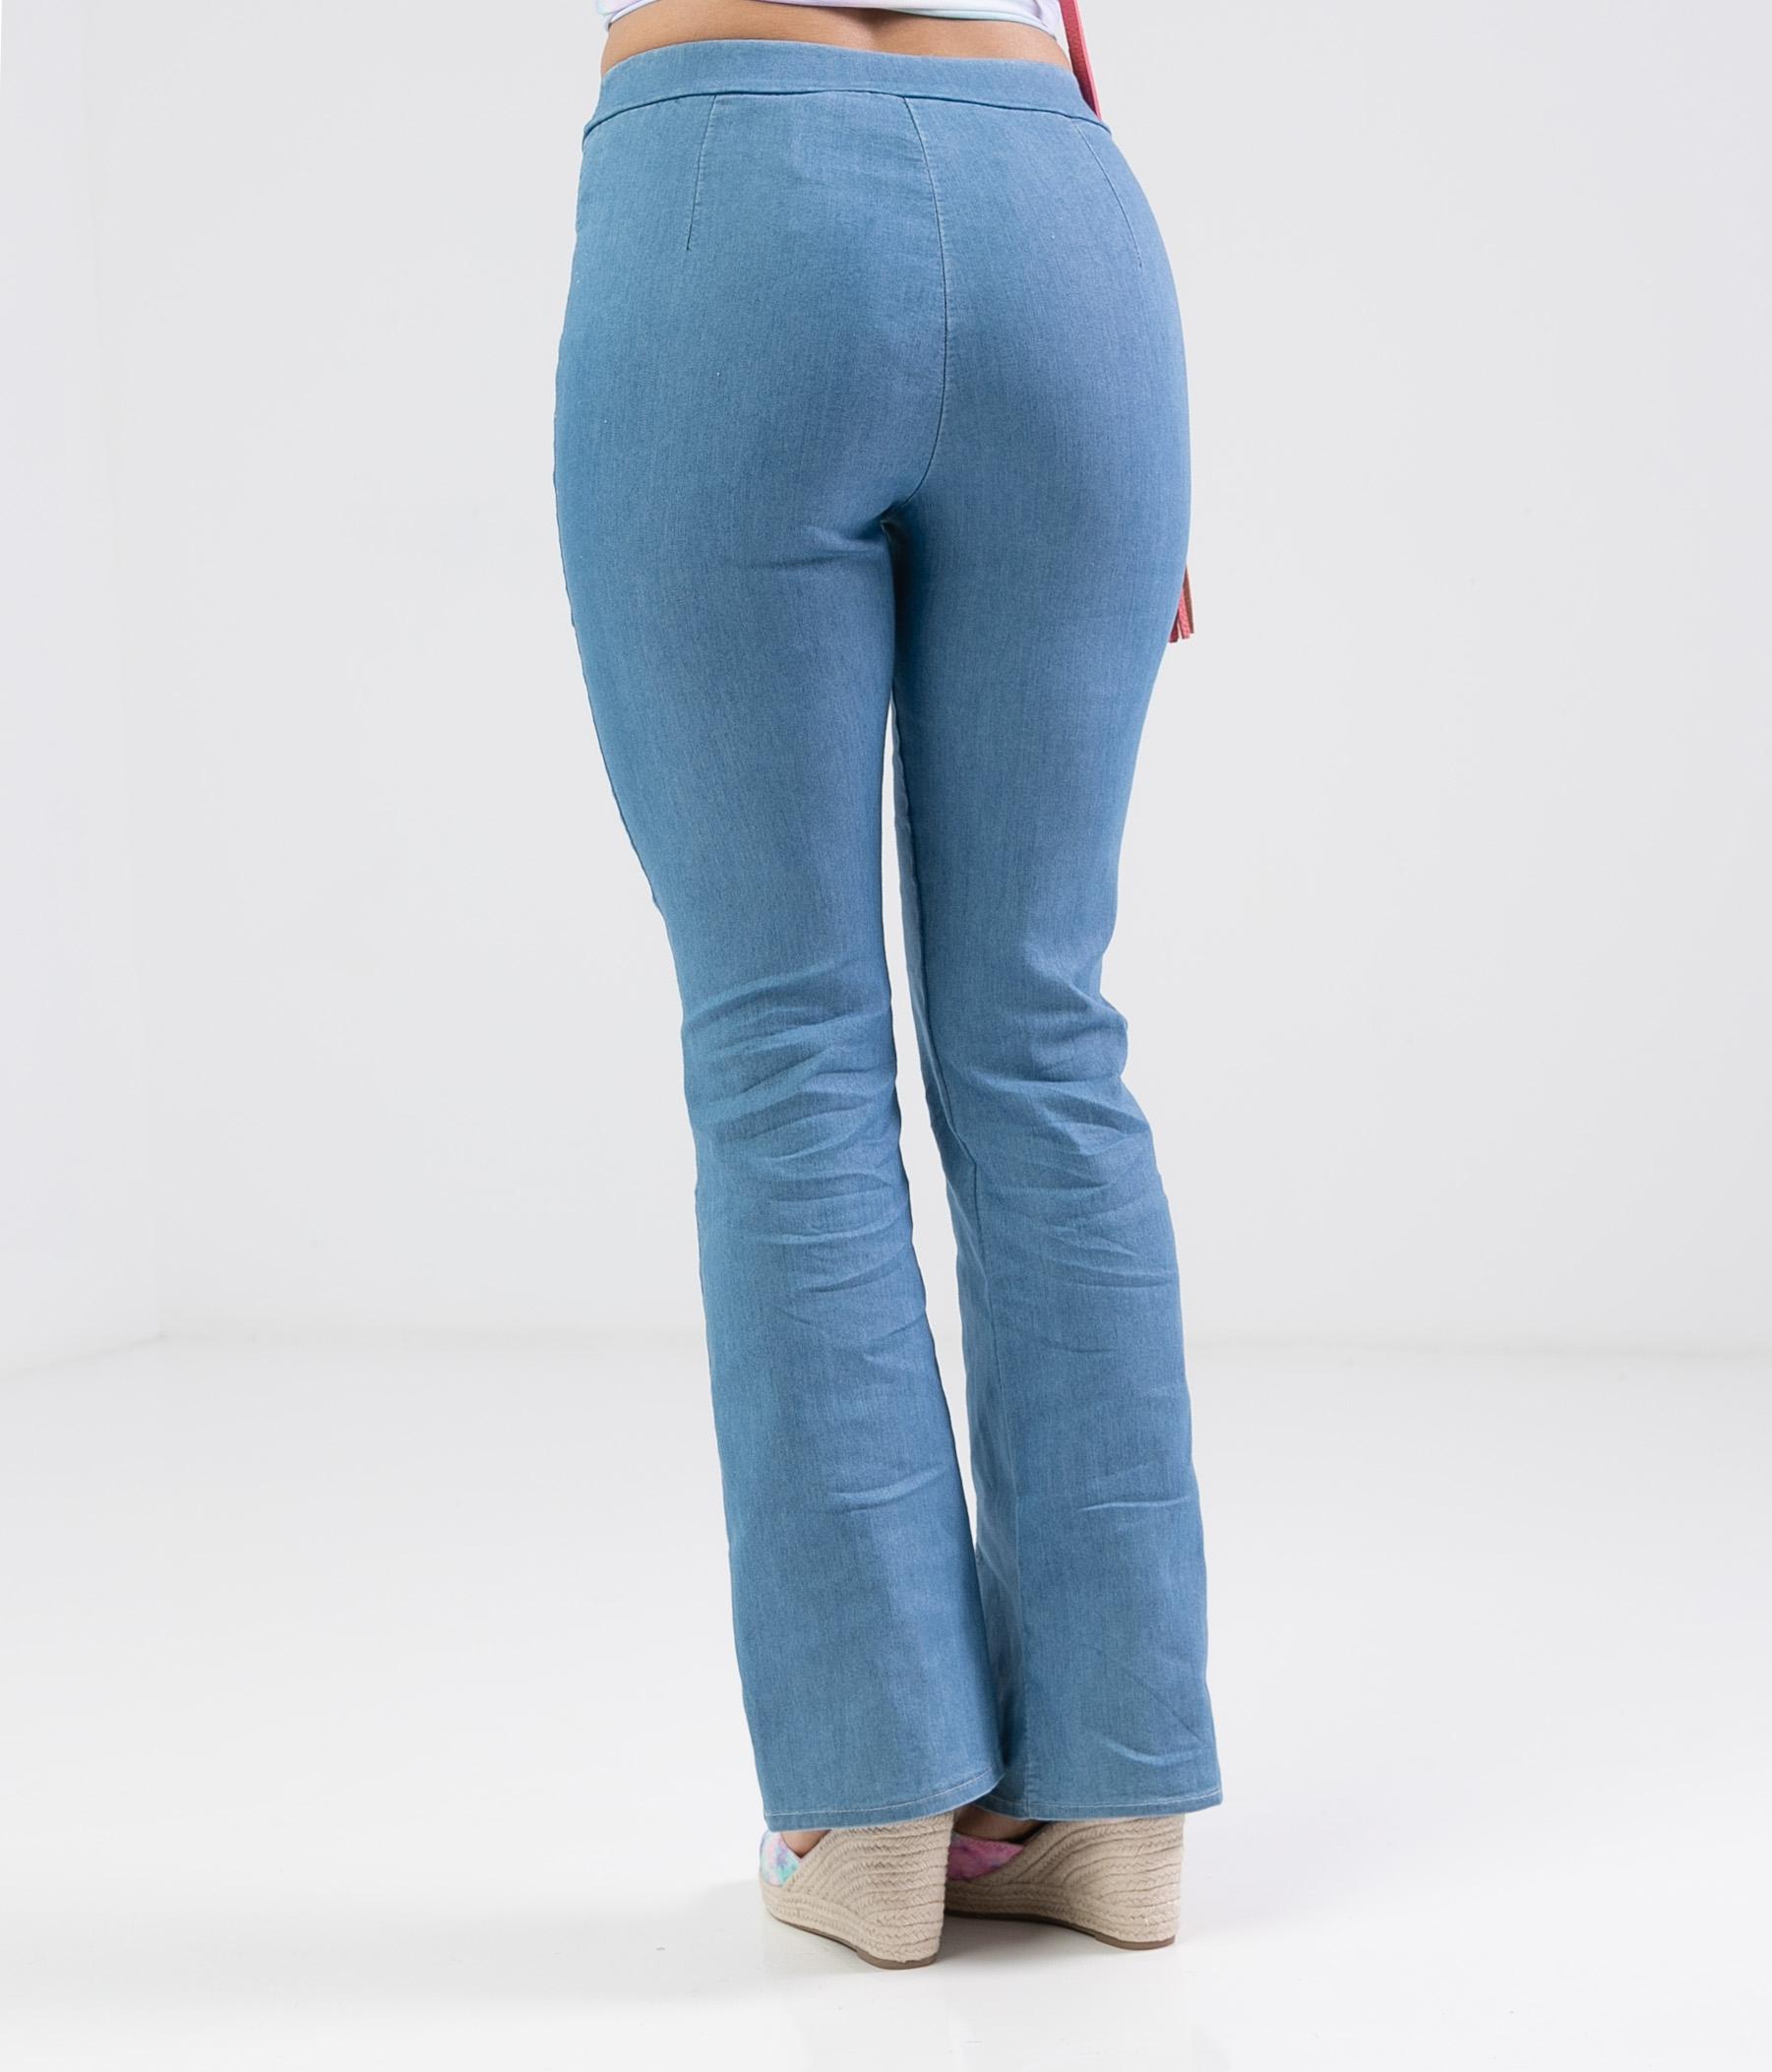 Pertrel Trousers - Denim